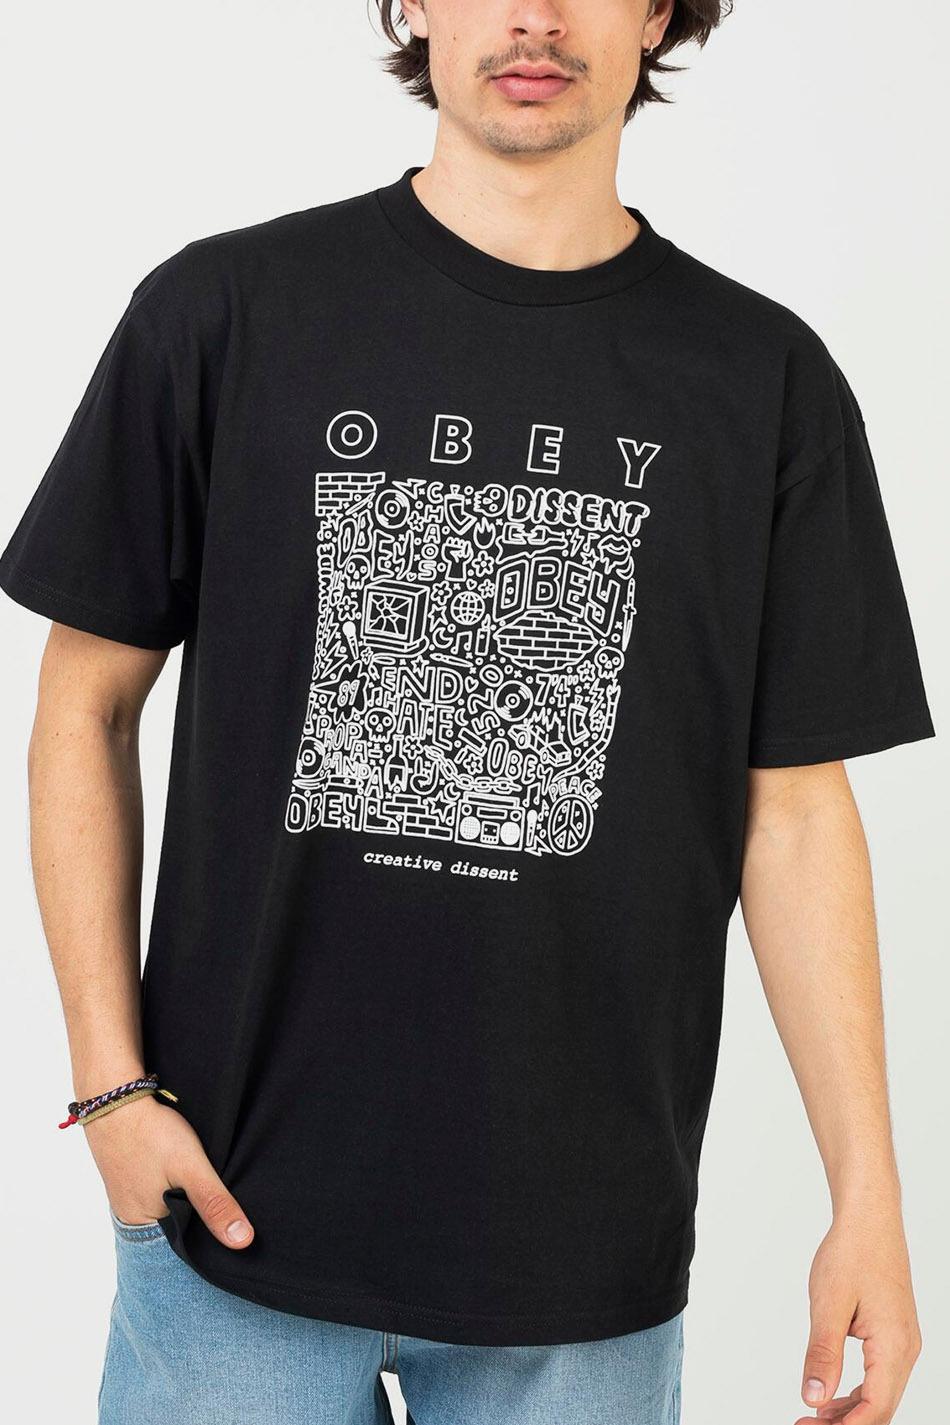 Obey Creative Dissent Classic Black T-shirt